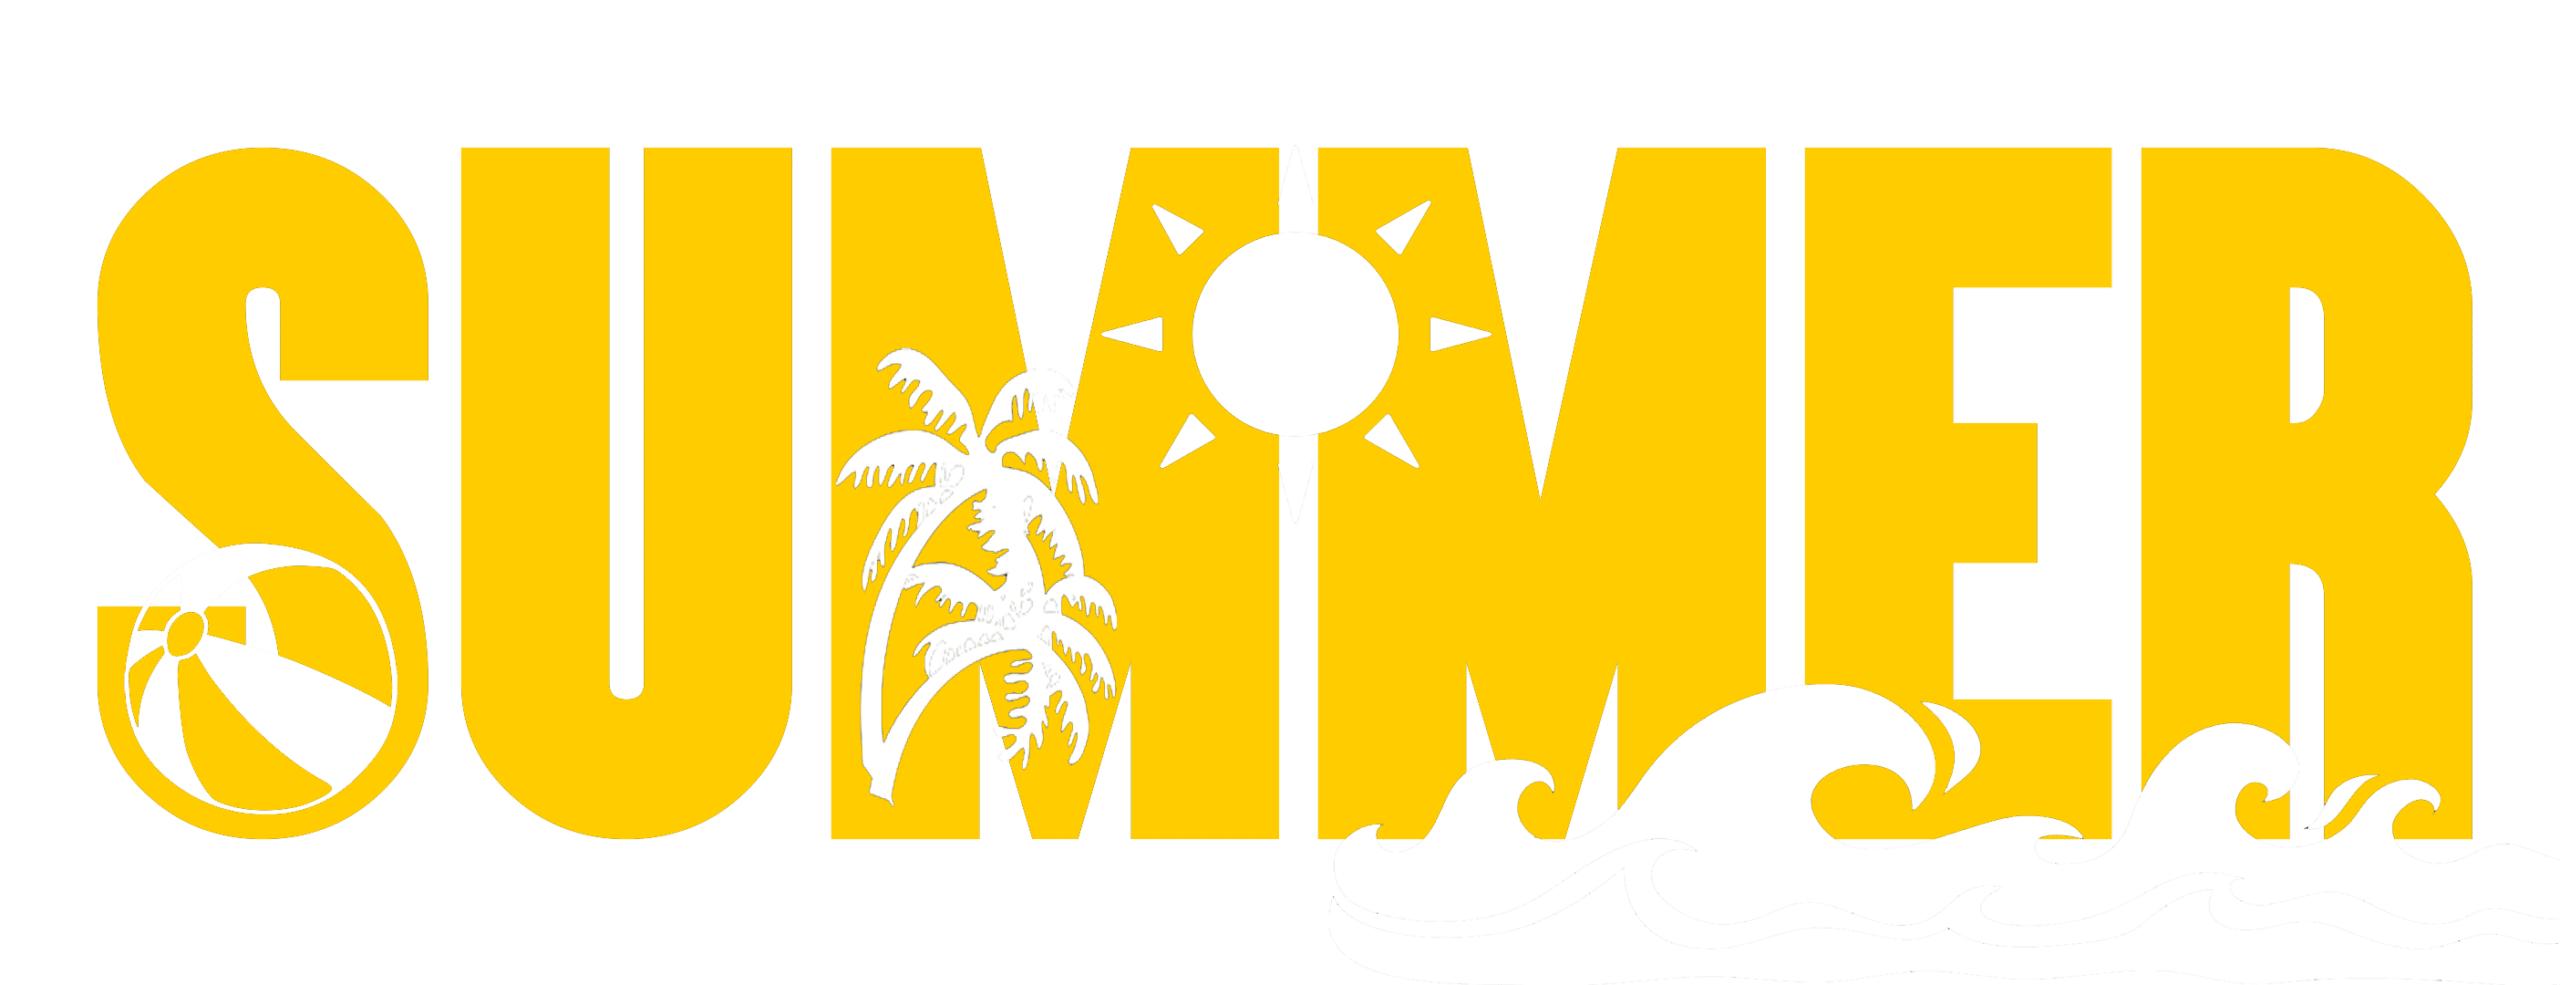 Free Summer SVG Cutting File